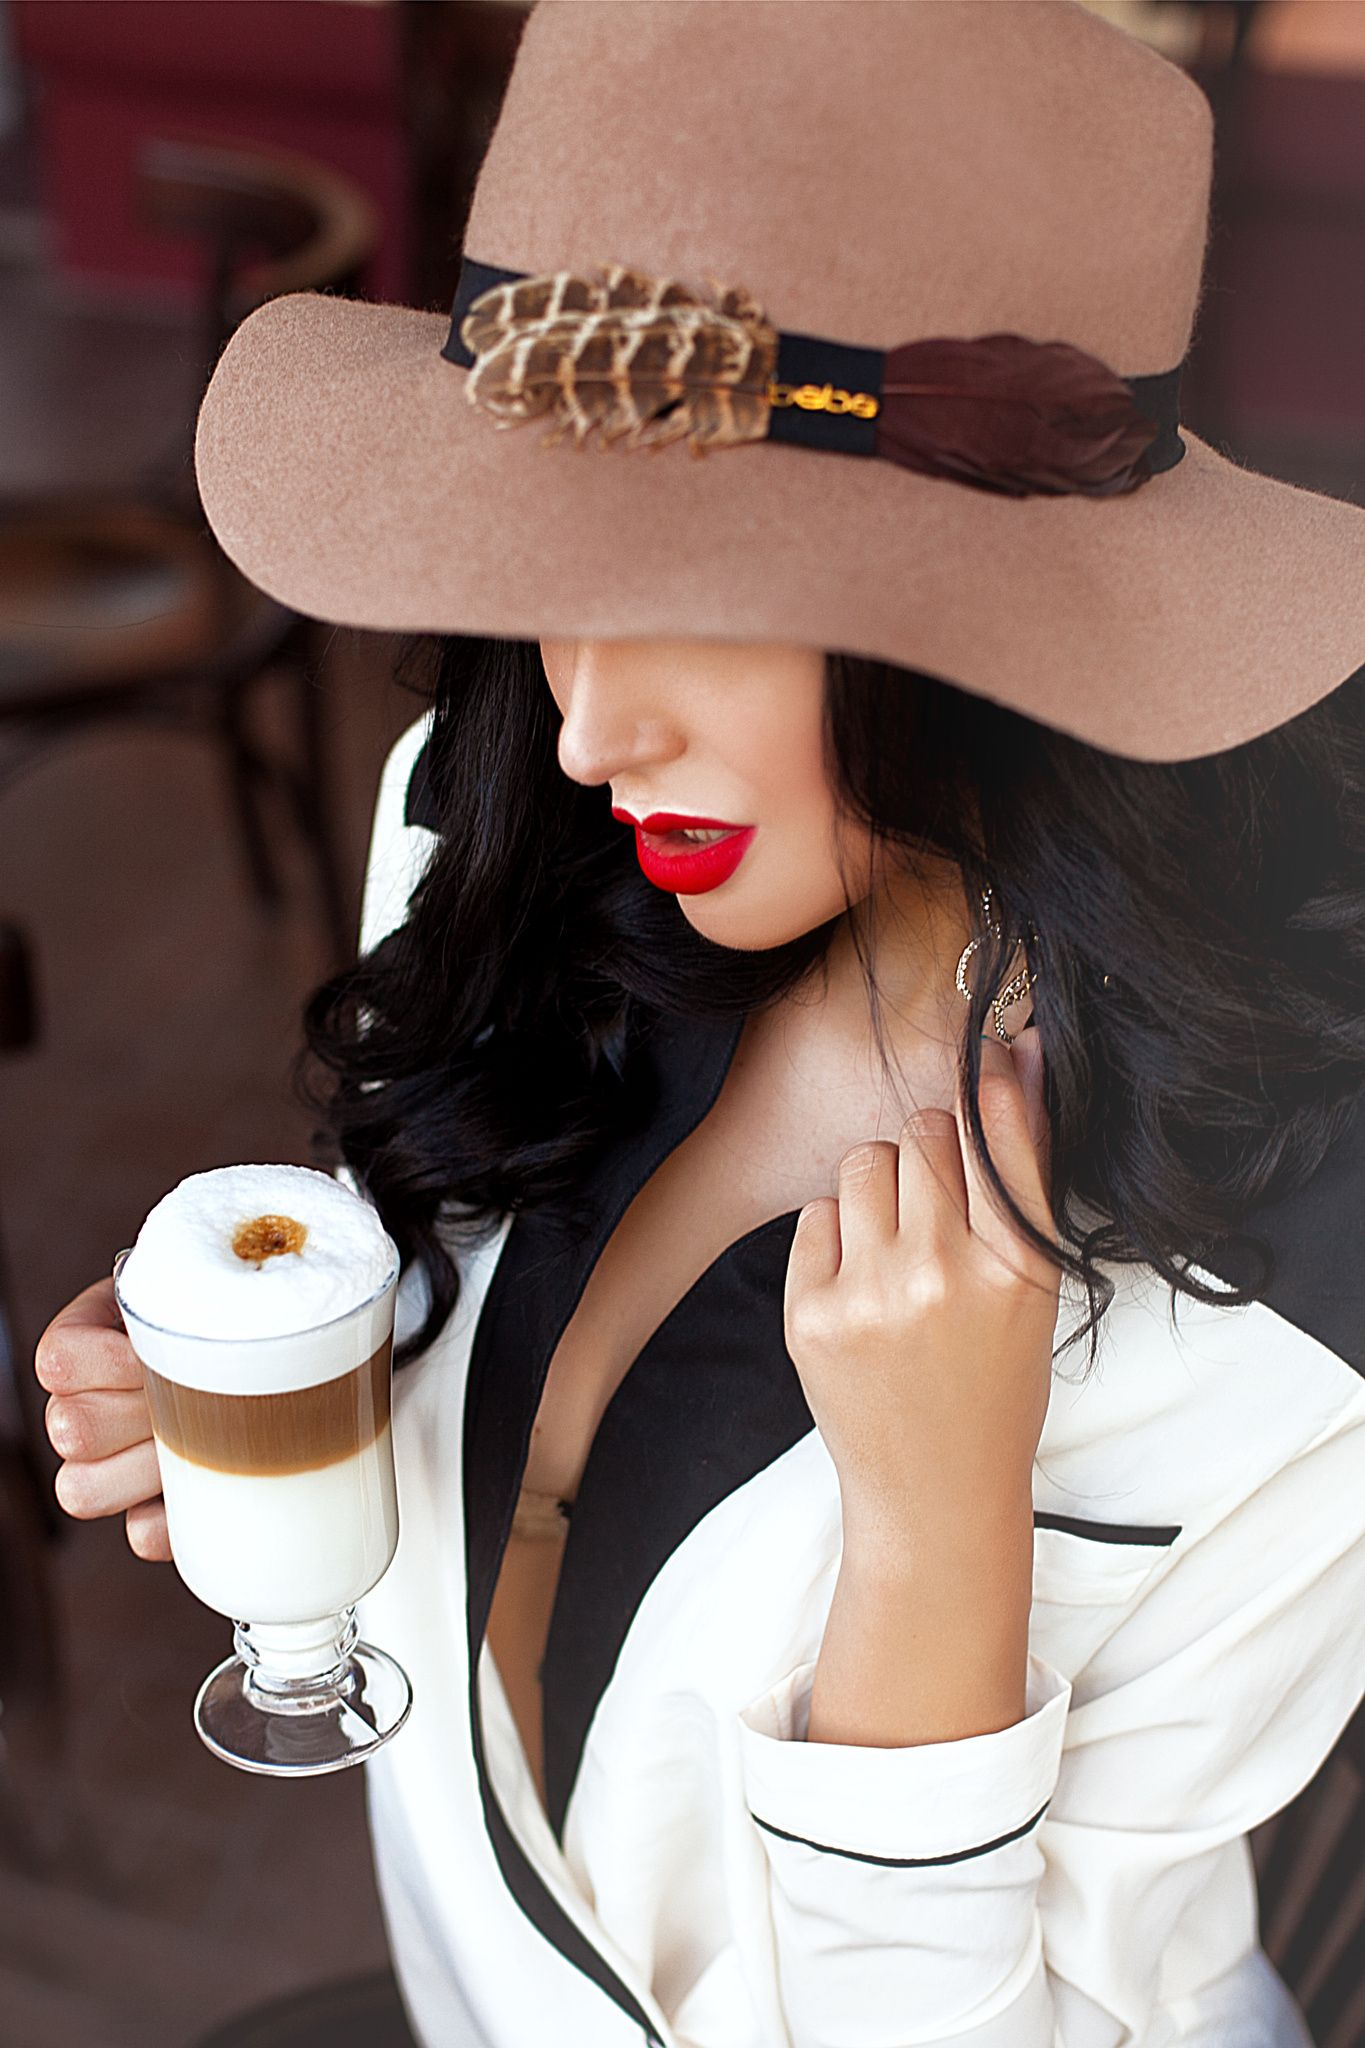 Bikini Barista Coffee Shop In California Has License Revoked